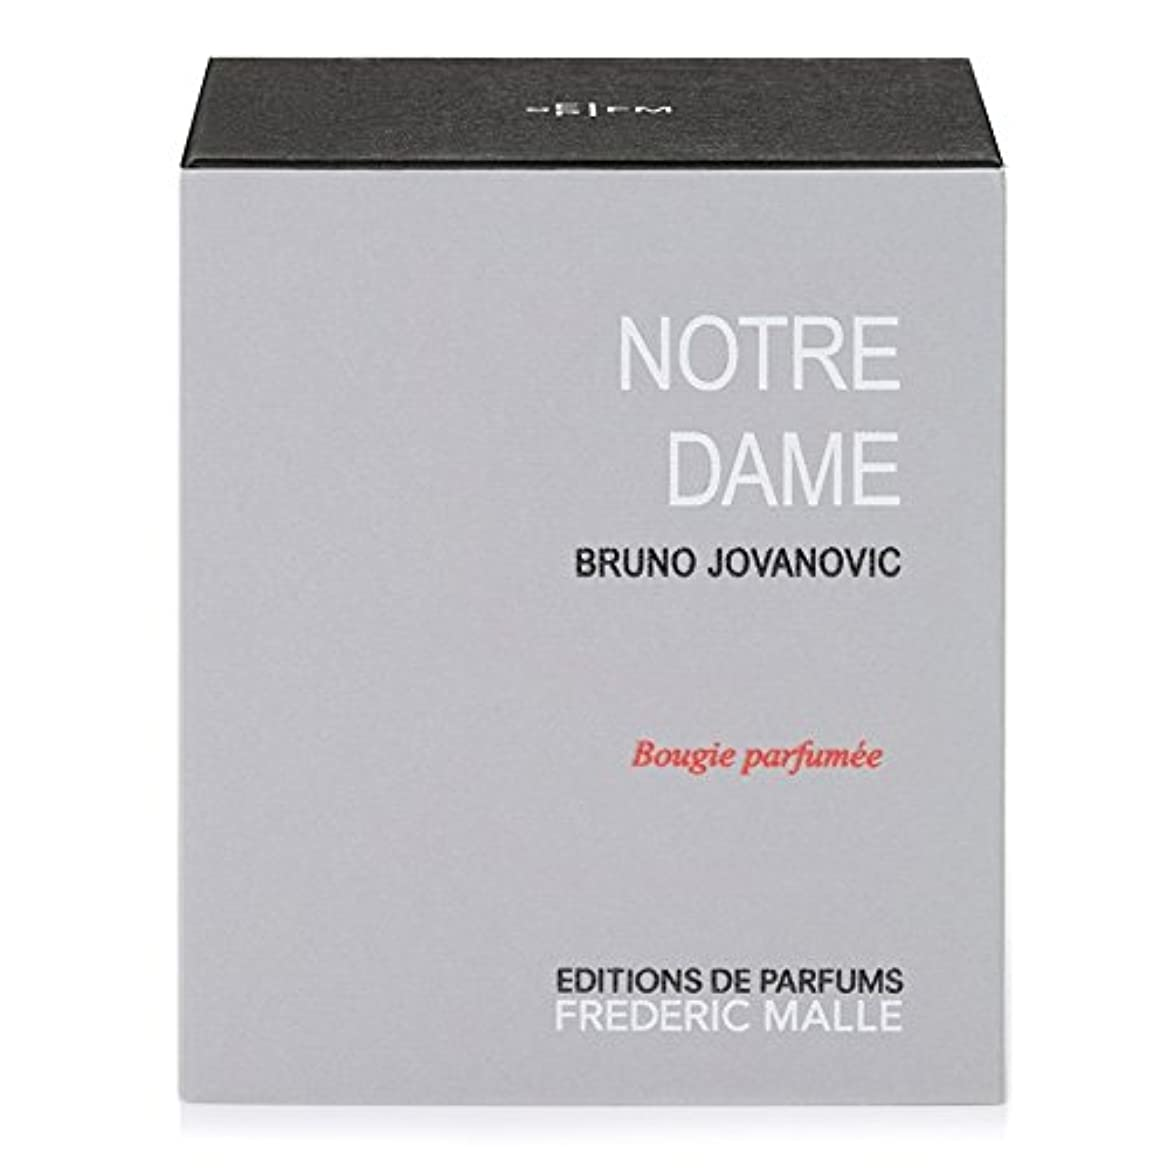 Frederic Malle Notre Dame Scented Candle 220g - フレデリック?マルノートルダム香りのキャンドル220グラム [並行輸入品]